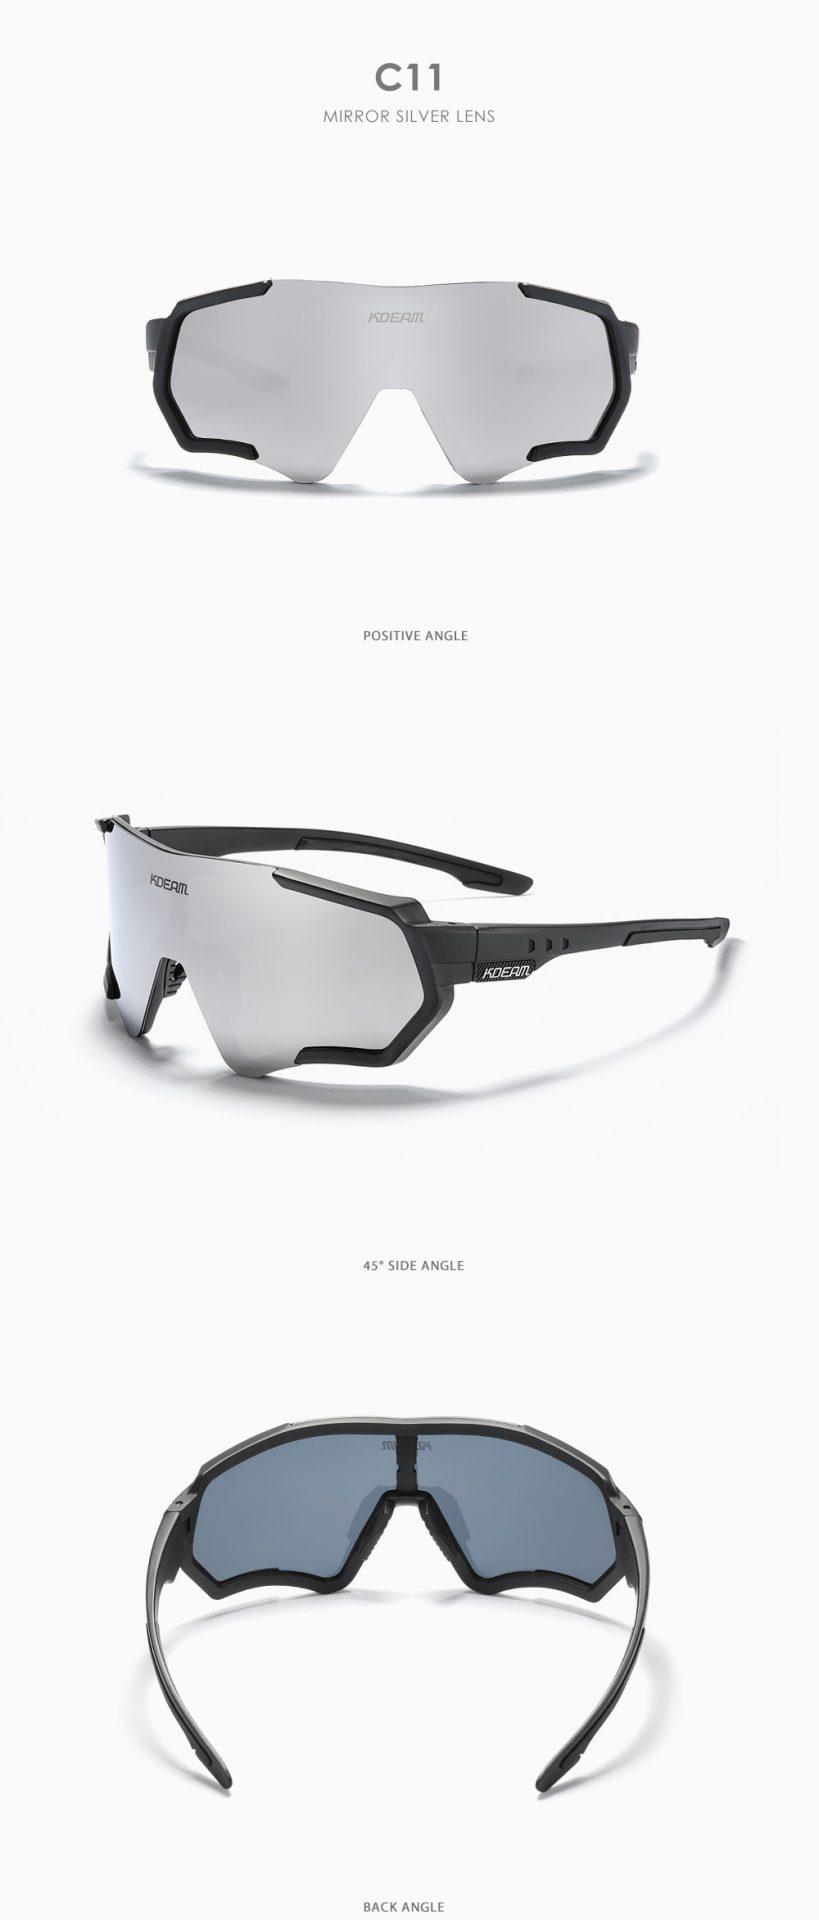 Outdoor Sports Men's Sunglasses TR90 Polarized